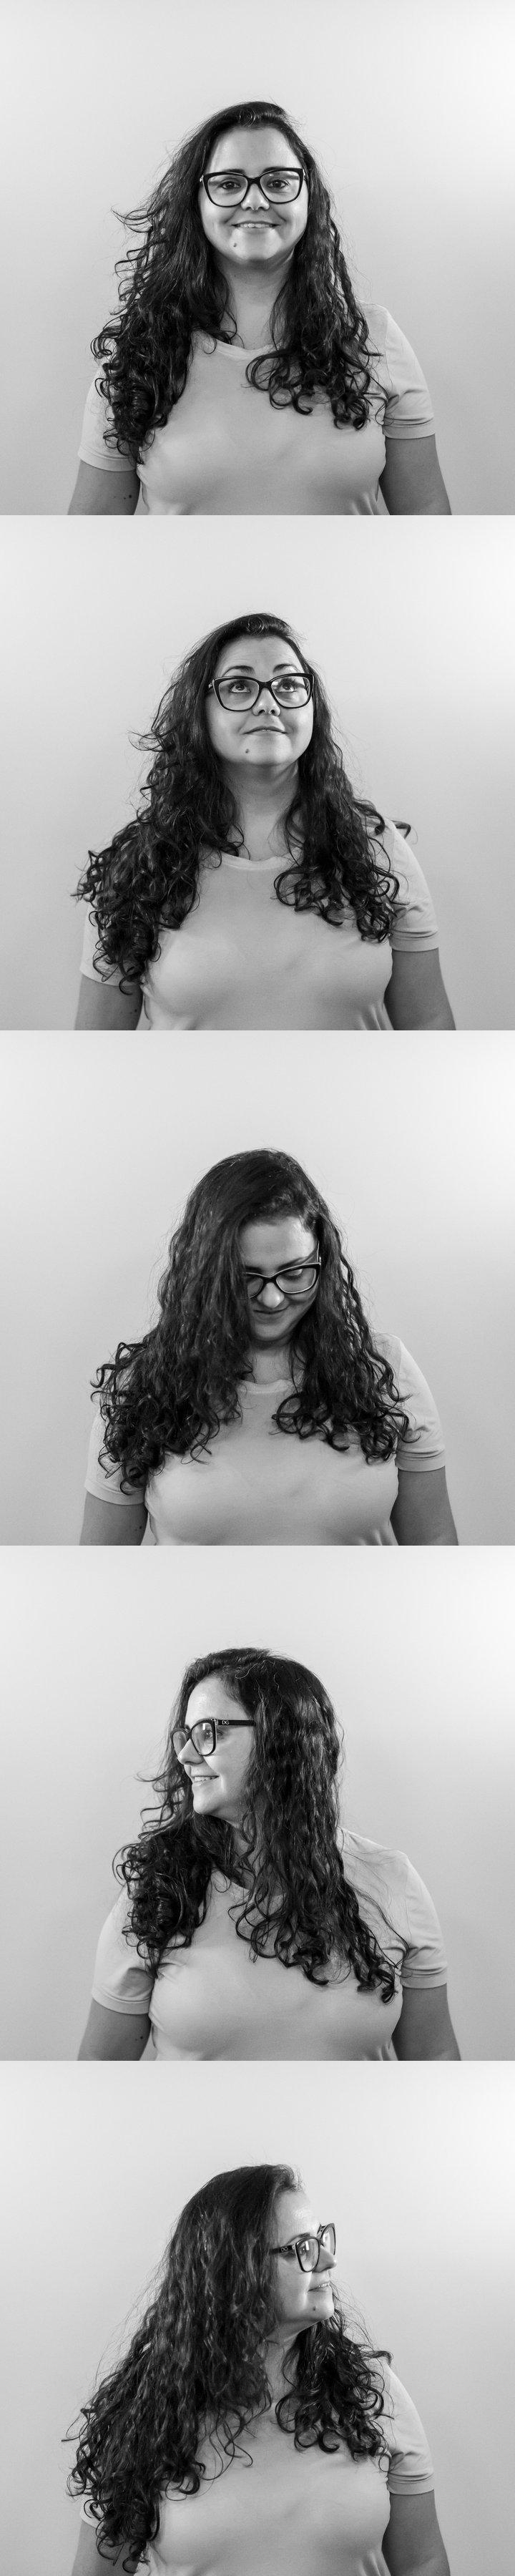 Janete Garcia